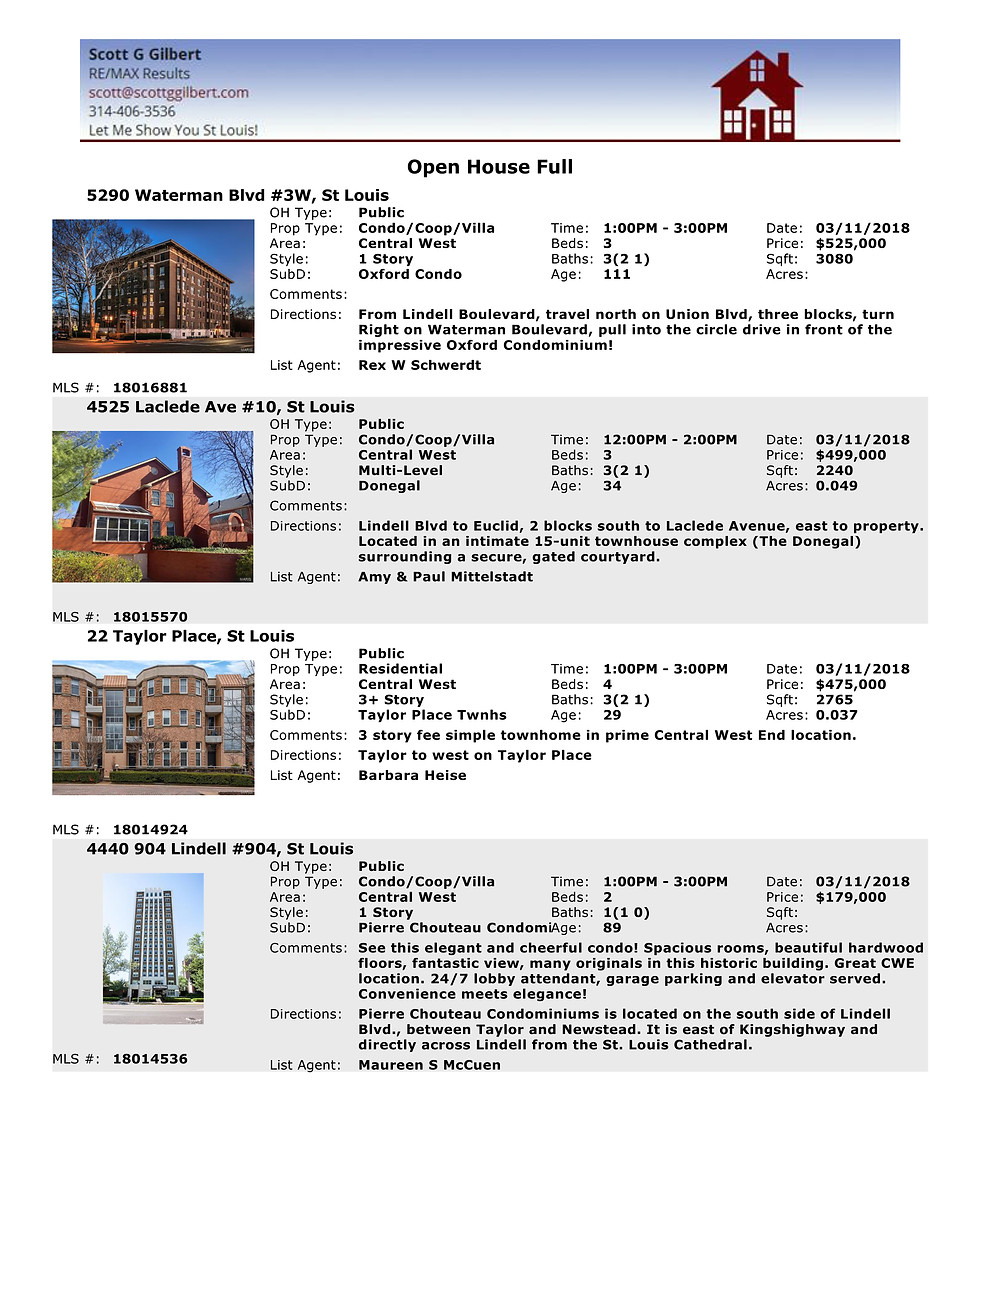 Open Houses 3.11.18 - St Louis - Central West End - 63108